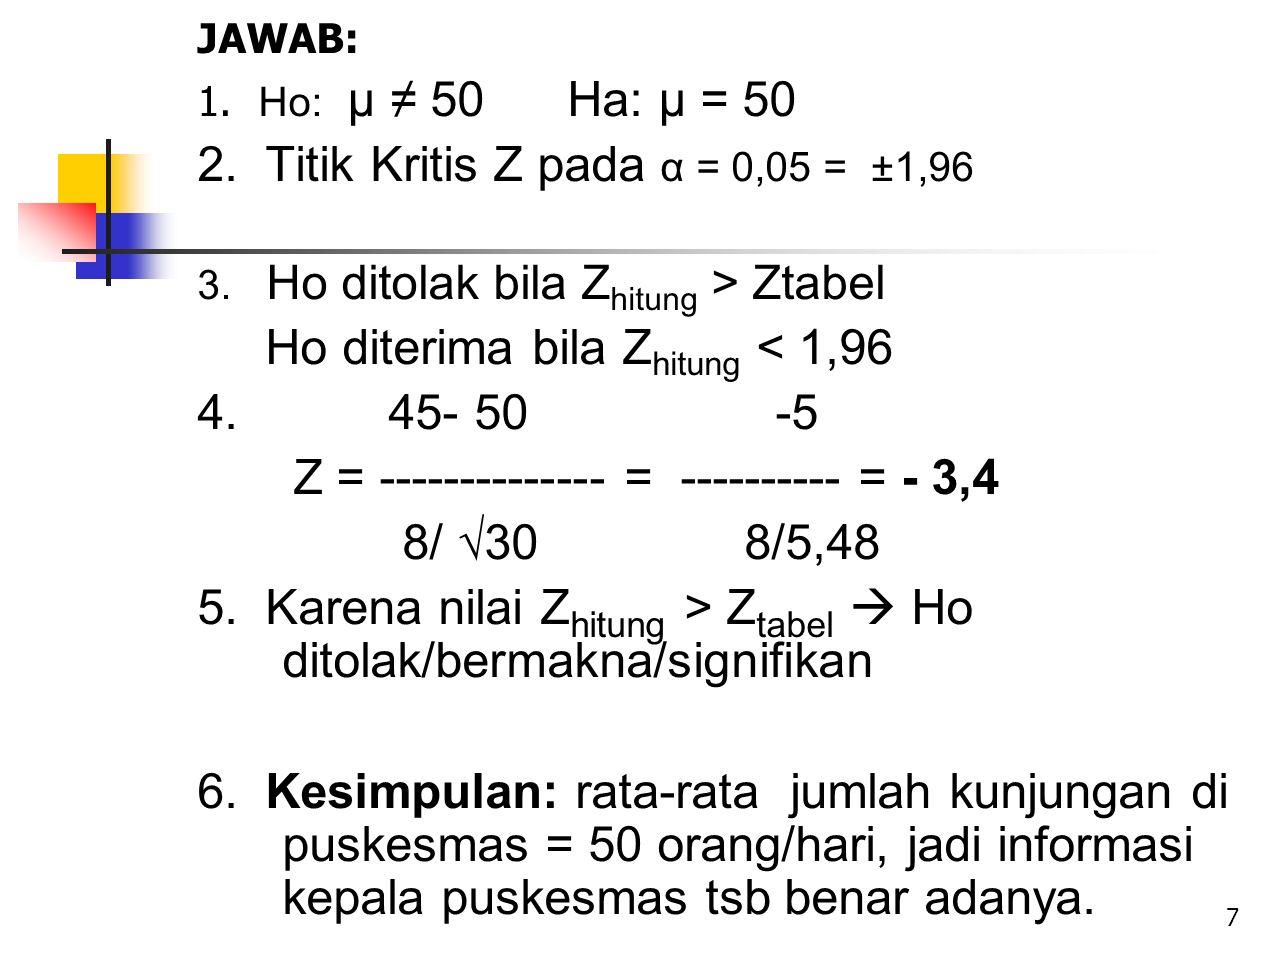 JAWAB: 1. Ho: µ ≠ 50 Ha: µ = 50 2. Titik Kritis Z pada α = 0,05 = ±1,96 3. Ho ditolak bila Z hitung > Ztabel Ho diterima bila Z hitung < 1,96 4. 45- 5